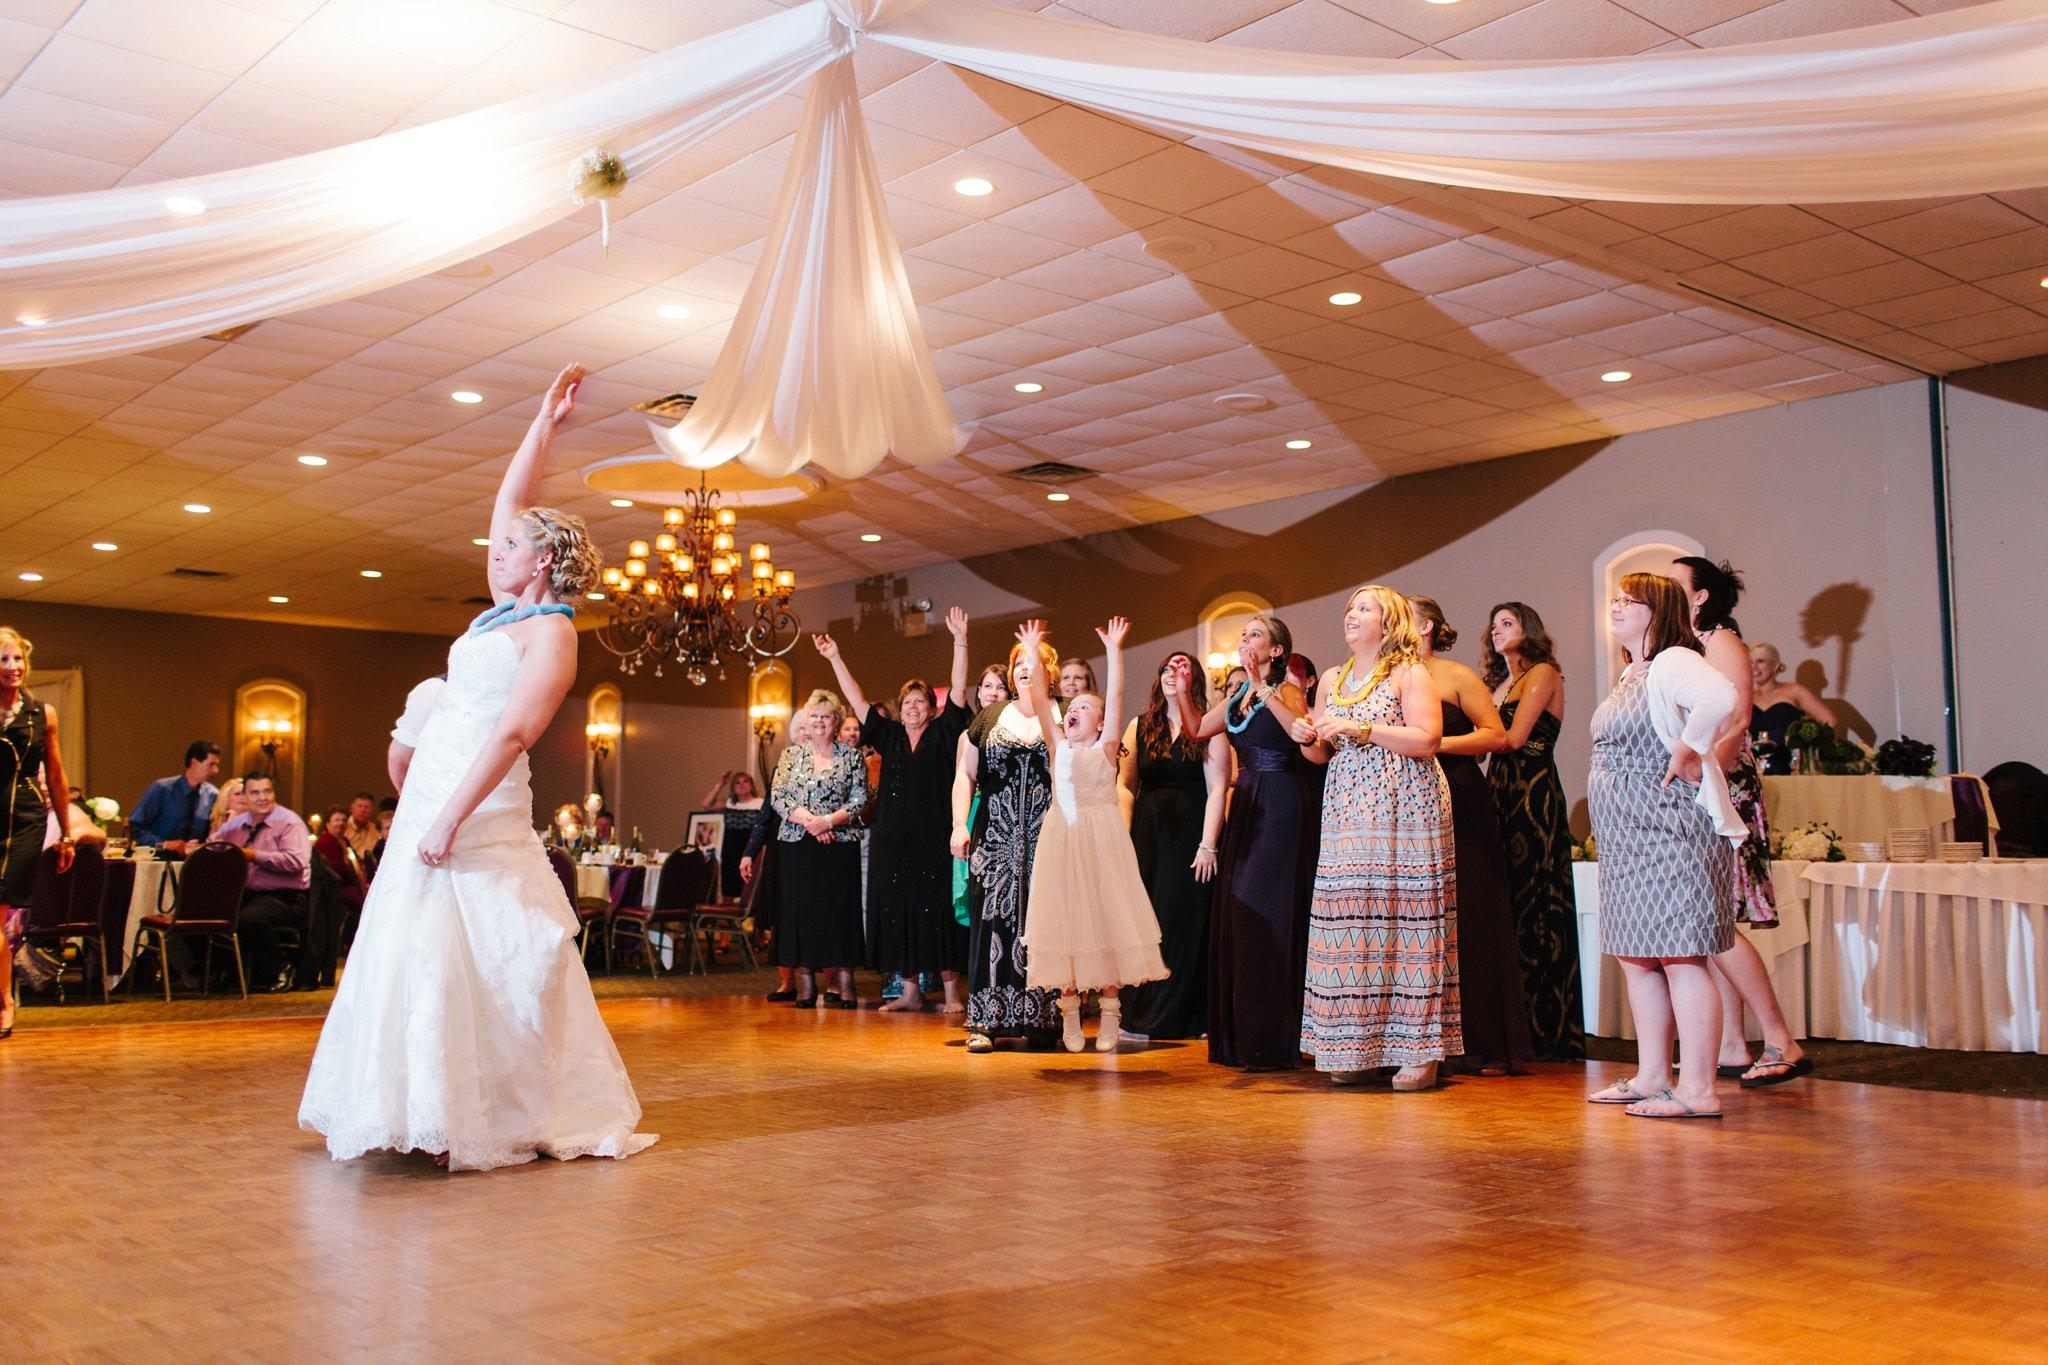 montdale_country_club_wedding_photos_photographer_scranton_pa8795.jpg